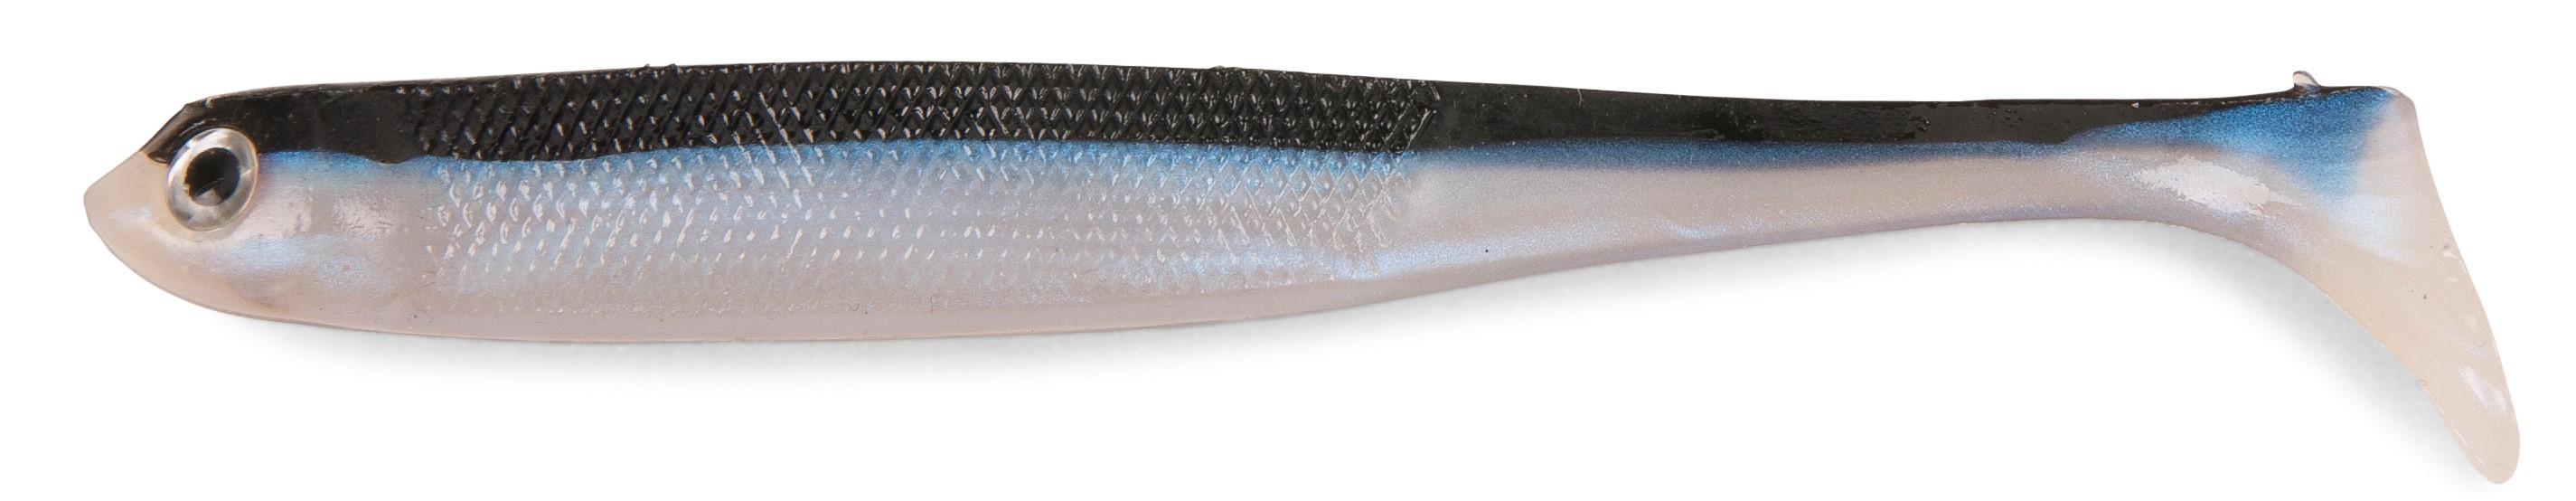 Iron Claw gumová nástraha Slim Jim 7 cm Vzor HR, 3 ks